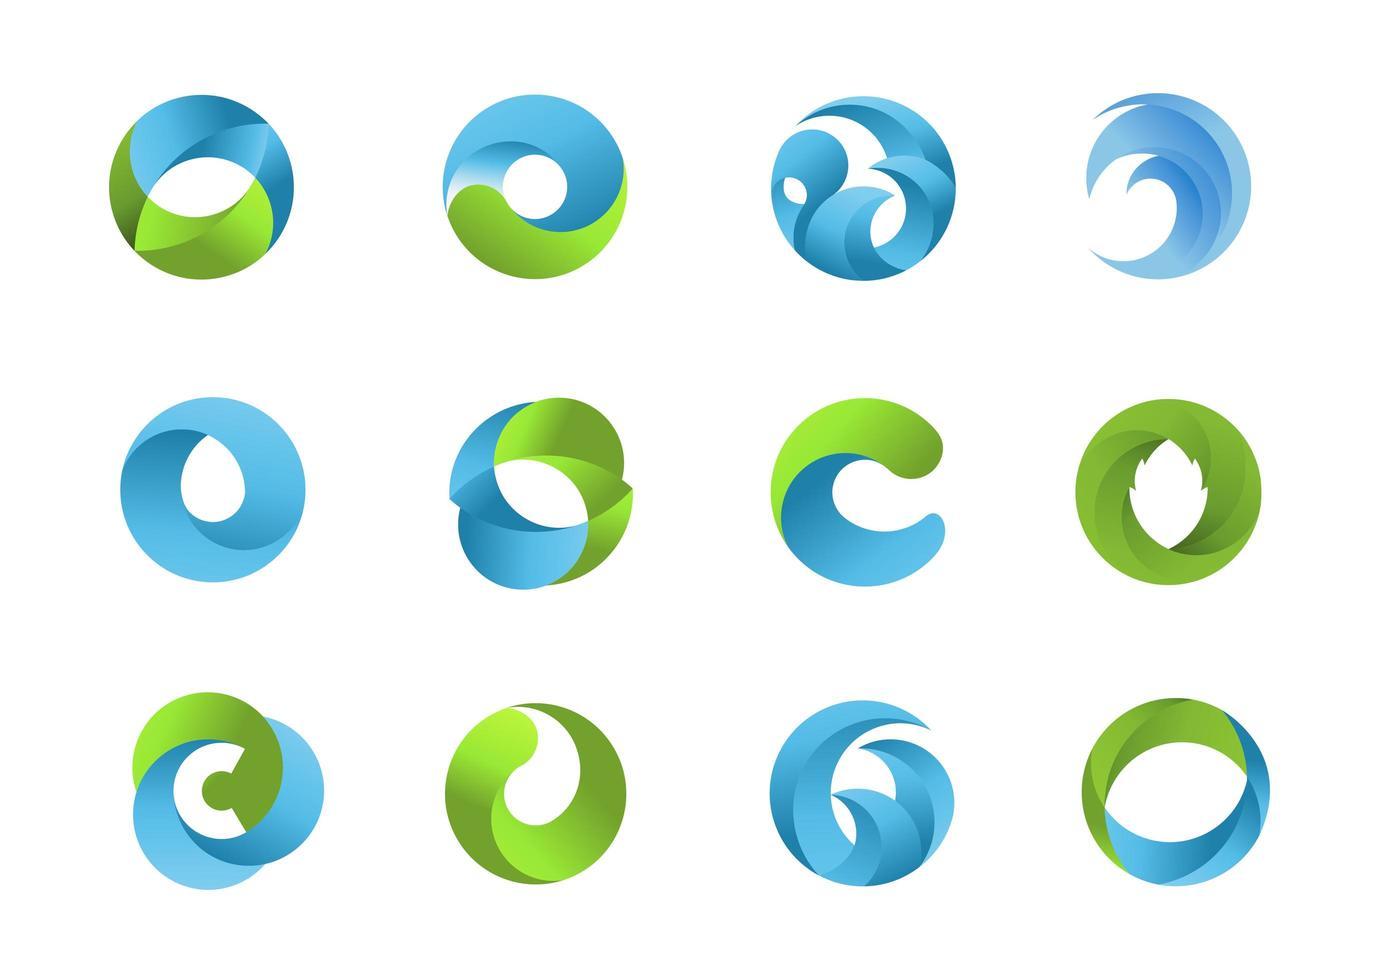 formes de logo circulaire naturel bleu et vert vecteur